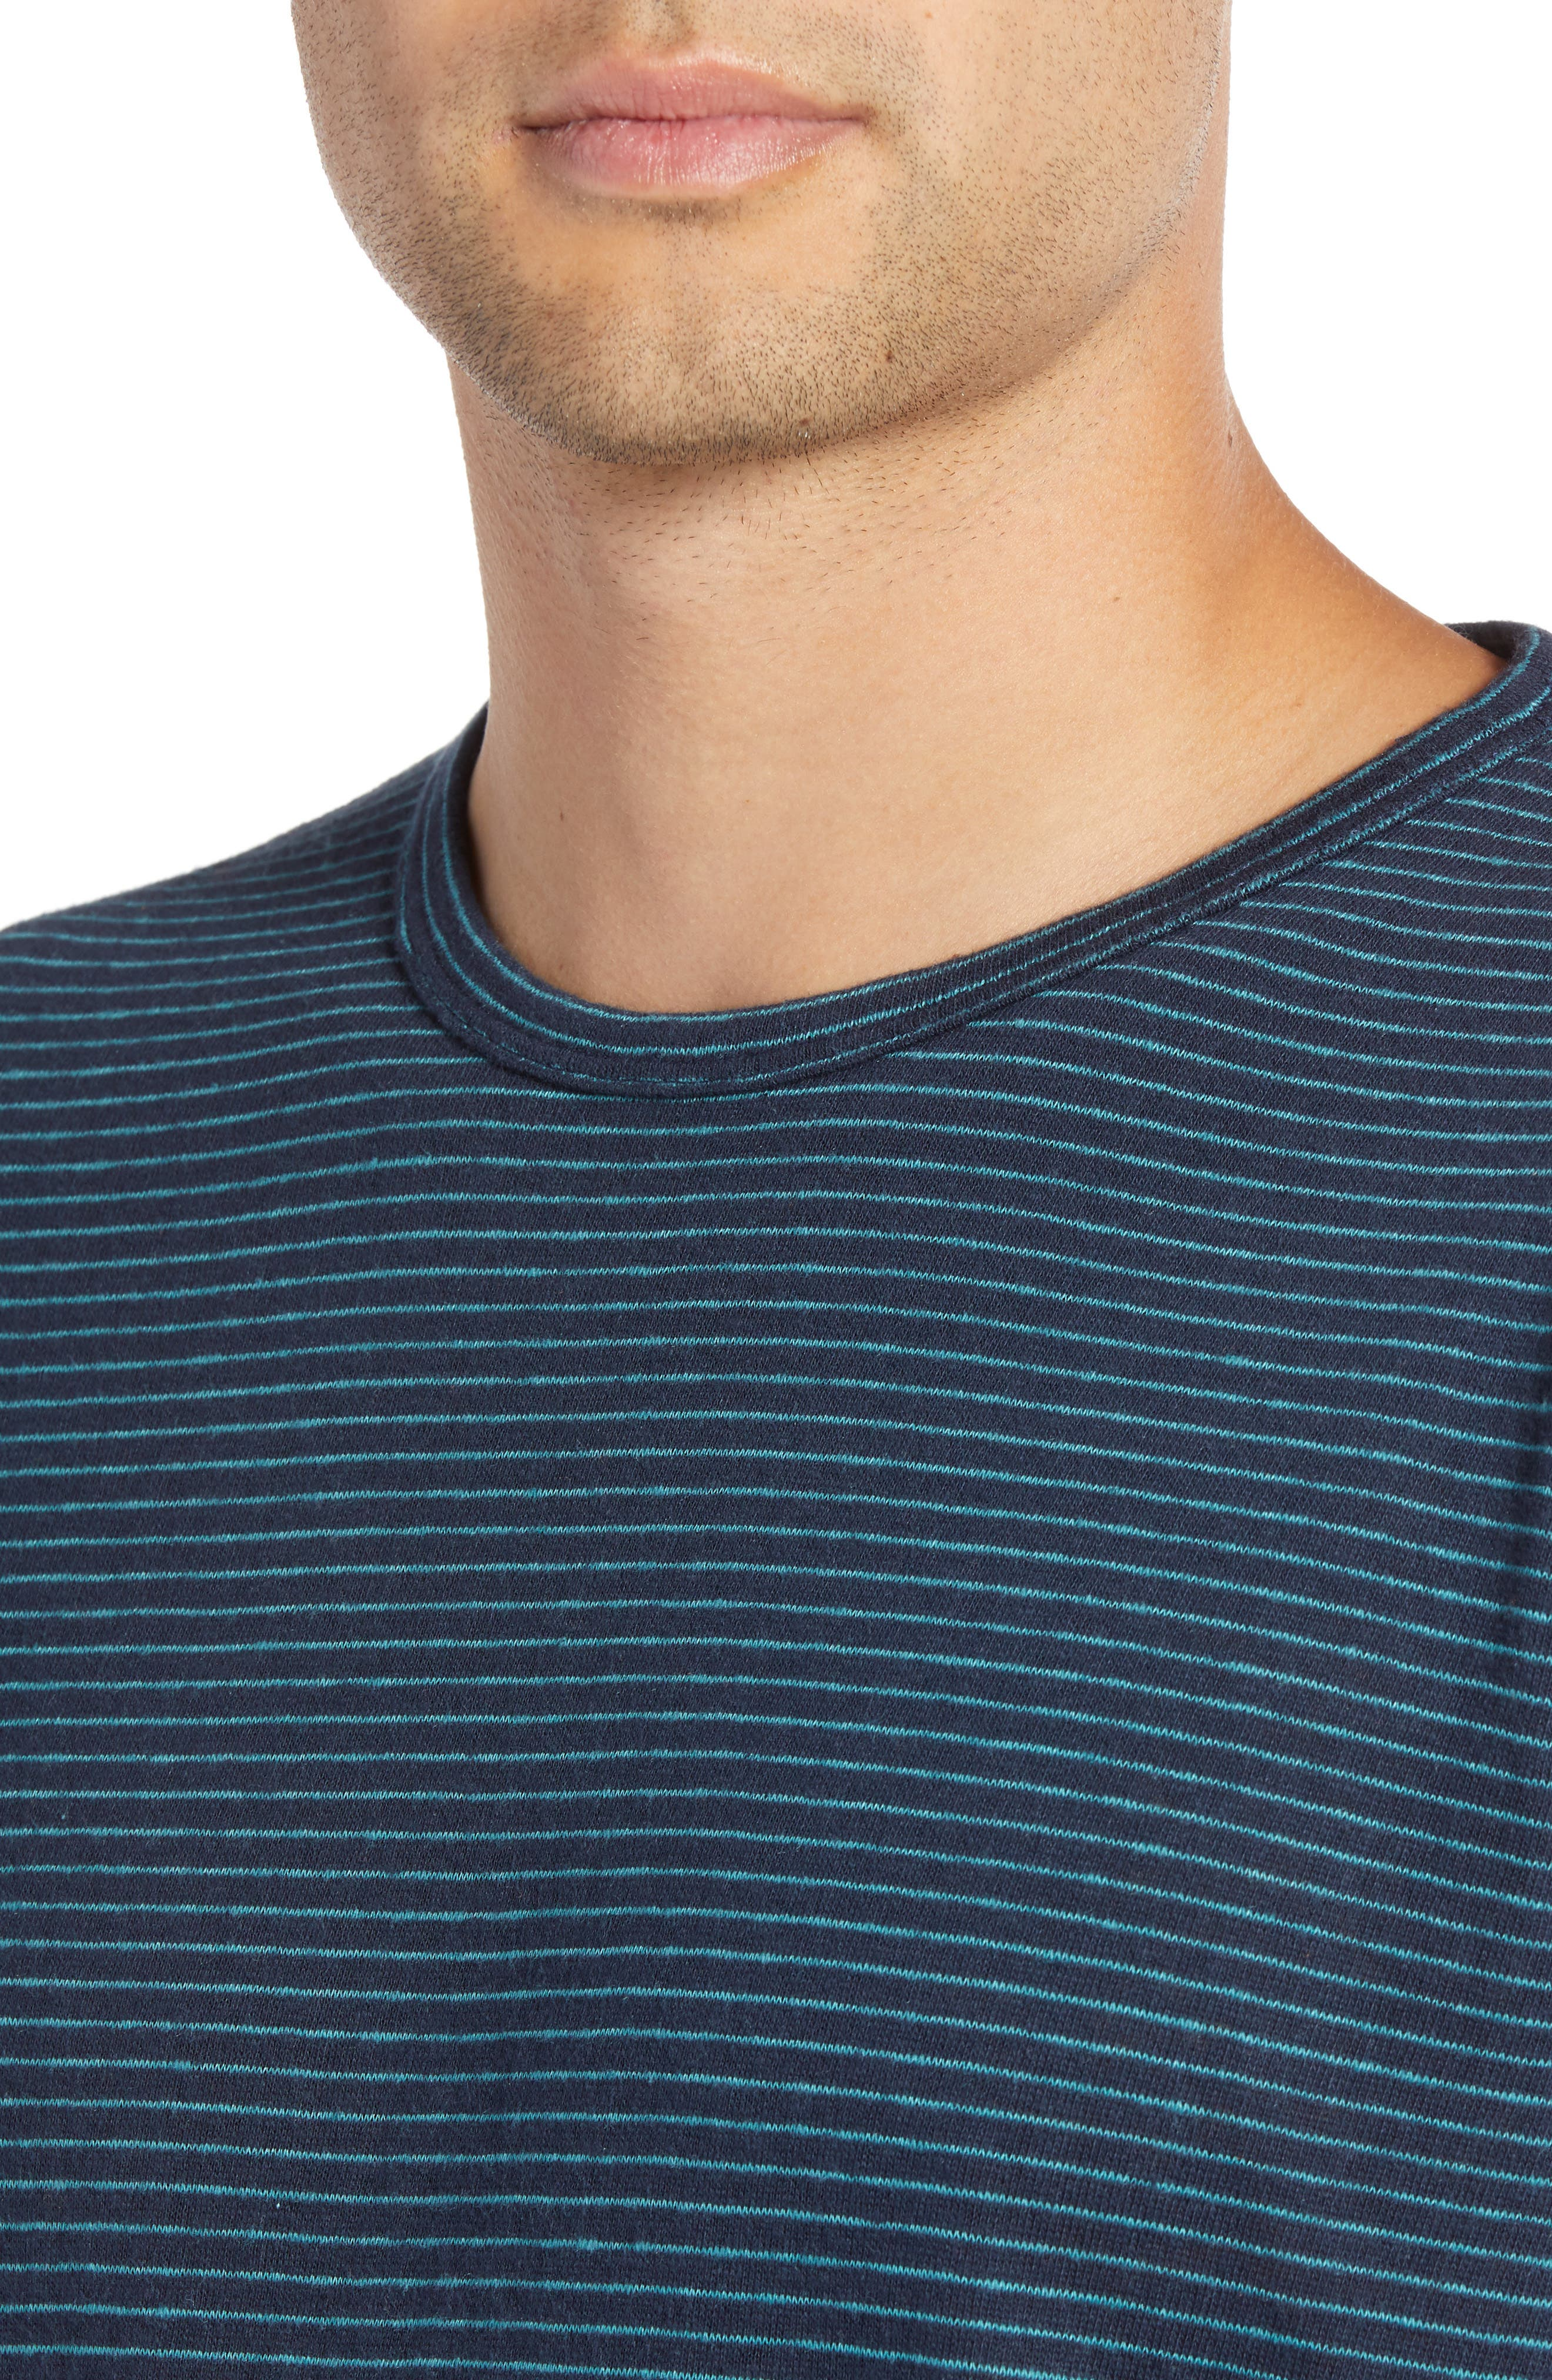 Narrow Stripe Long Sleeve T-Shirt,                             Alternate thumbnail 4, color,                             NAVY/ BLUE